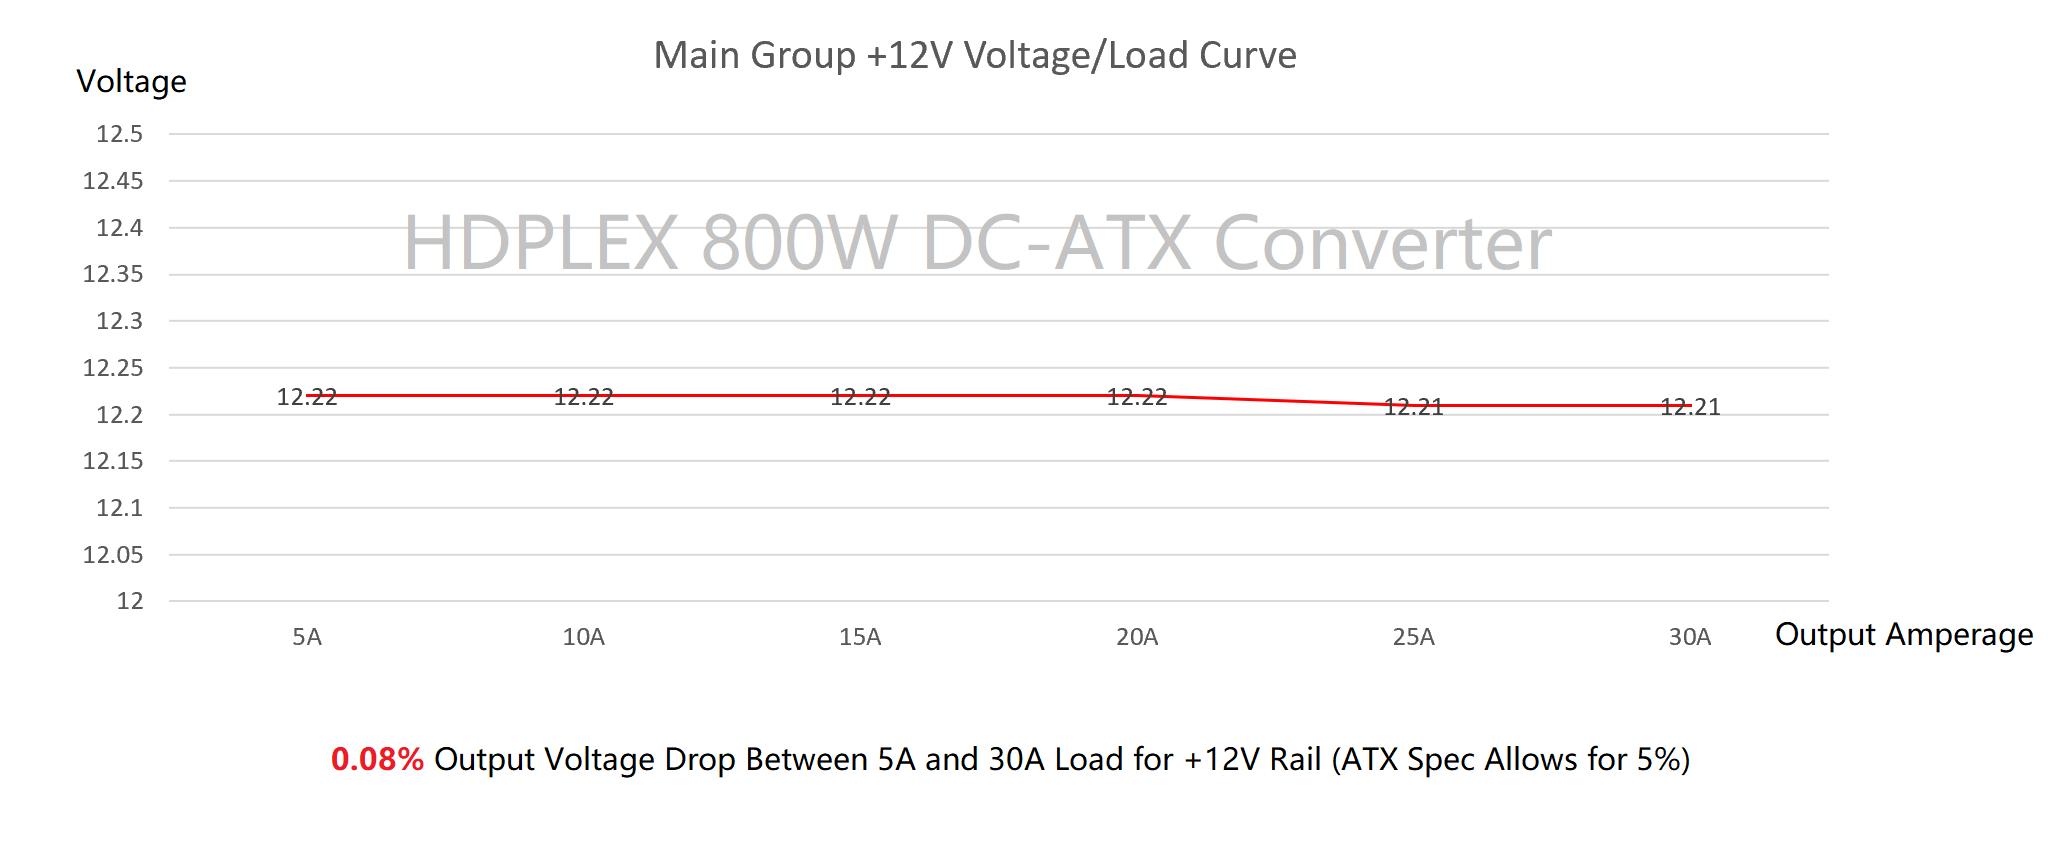 HDPLEX 800W DC-ATX with 16V-63VDC Input